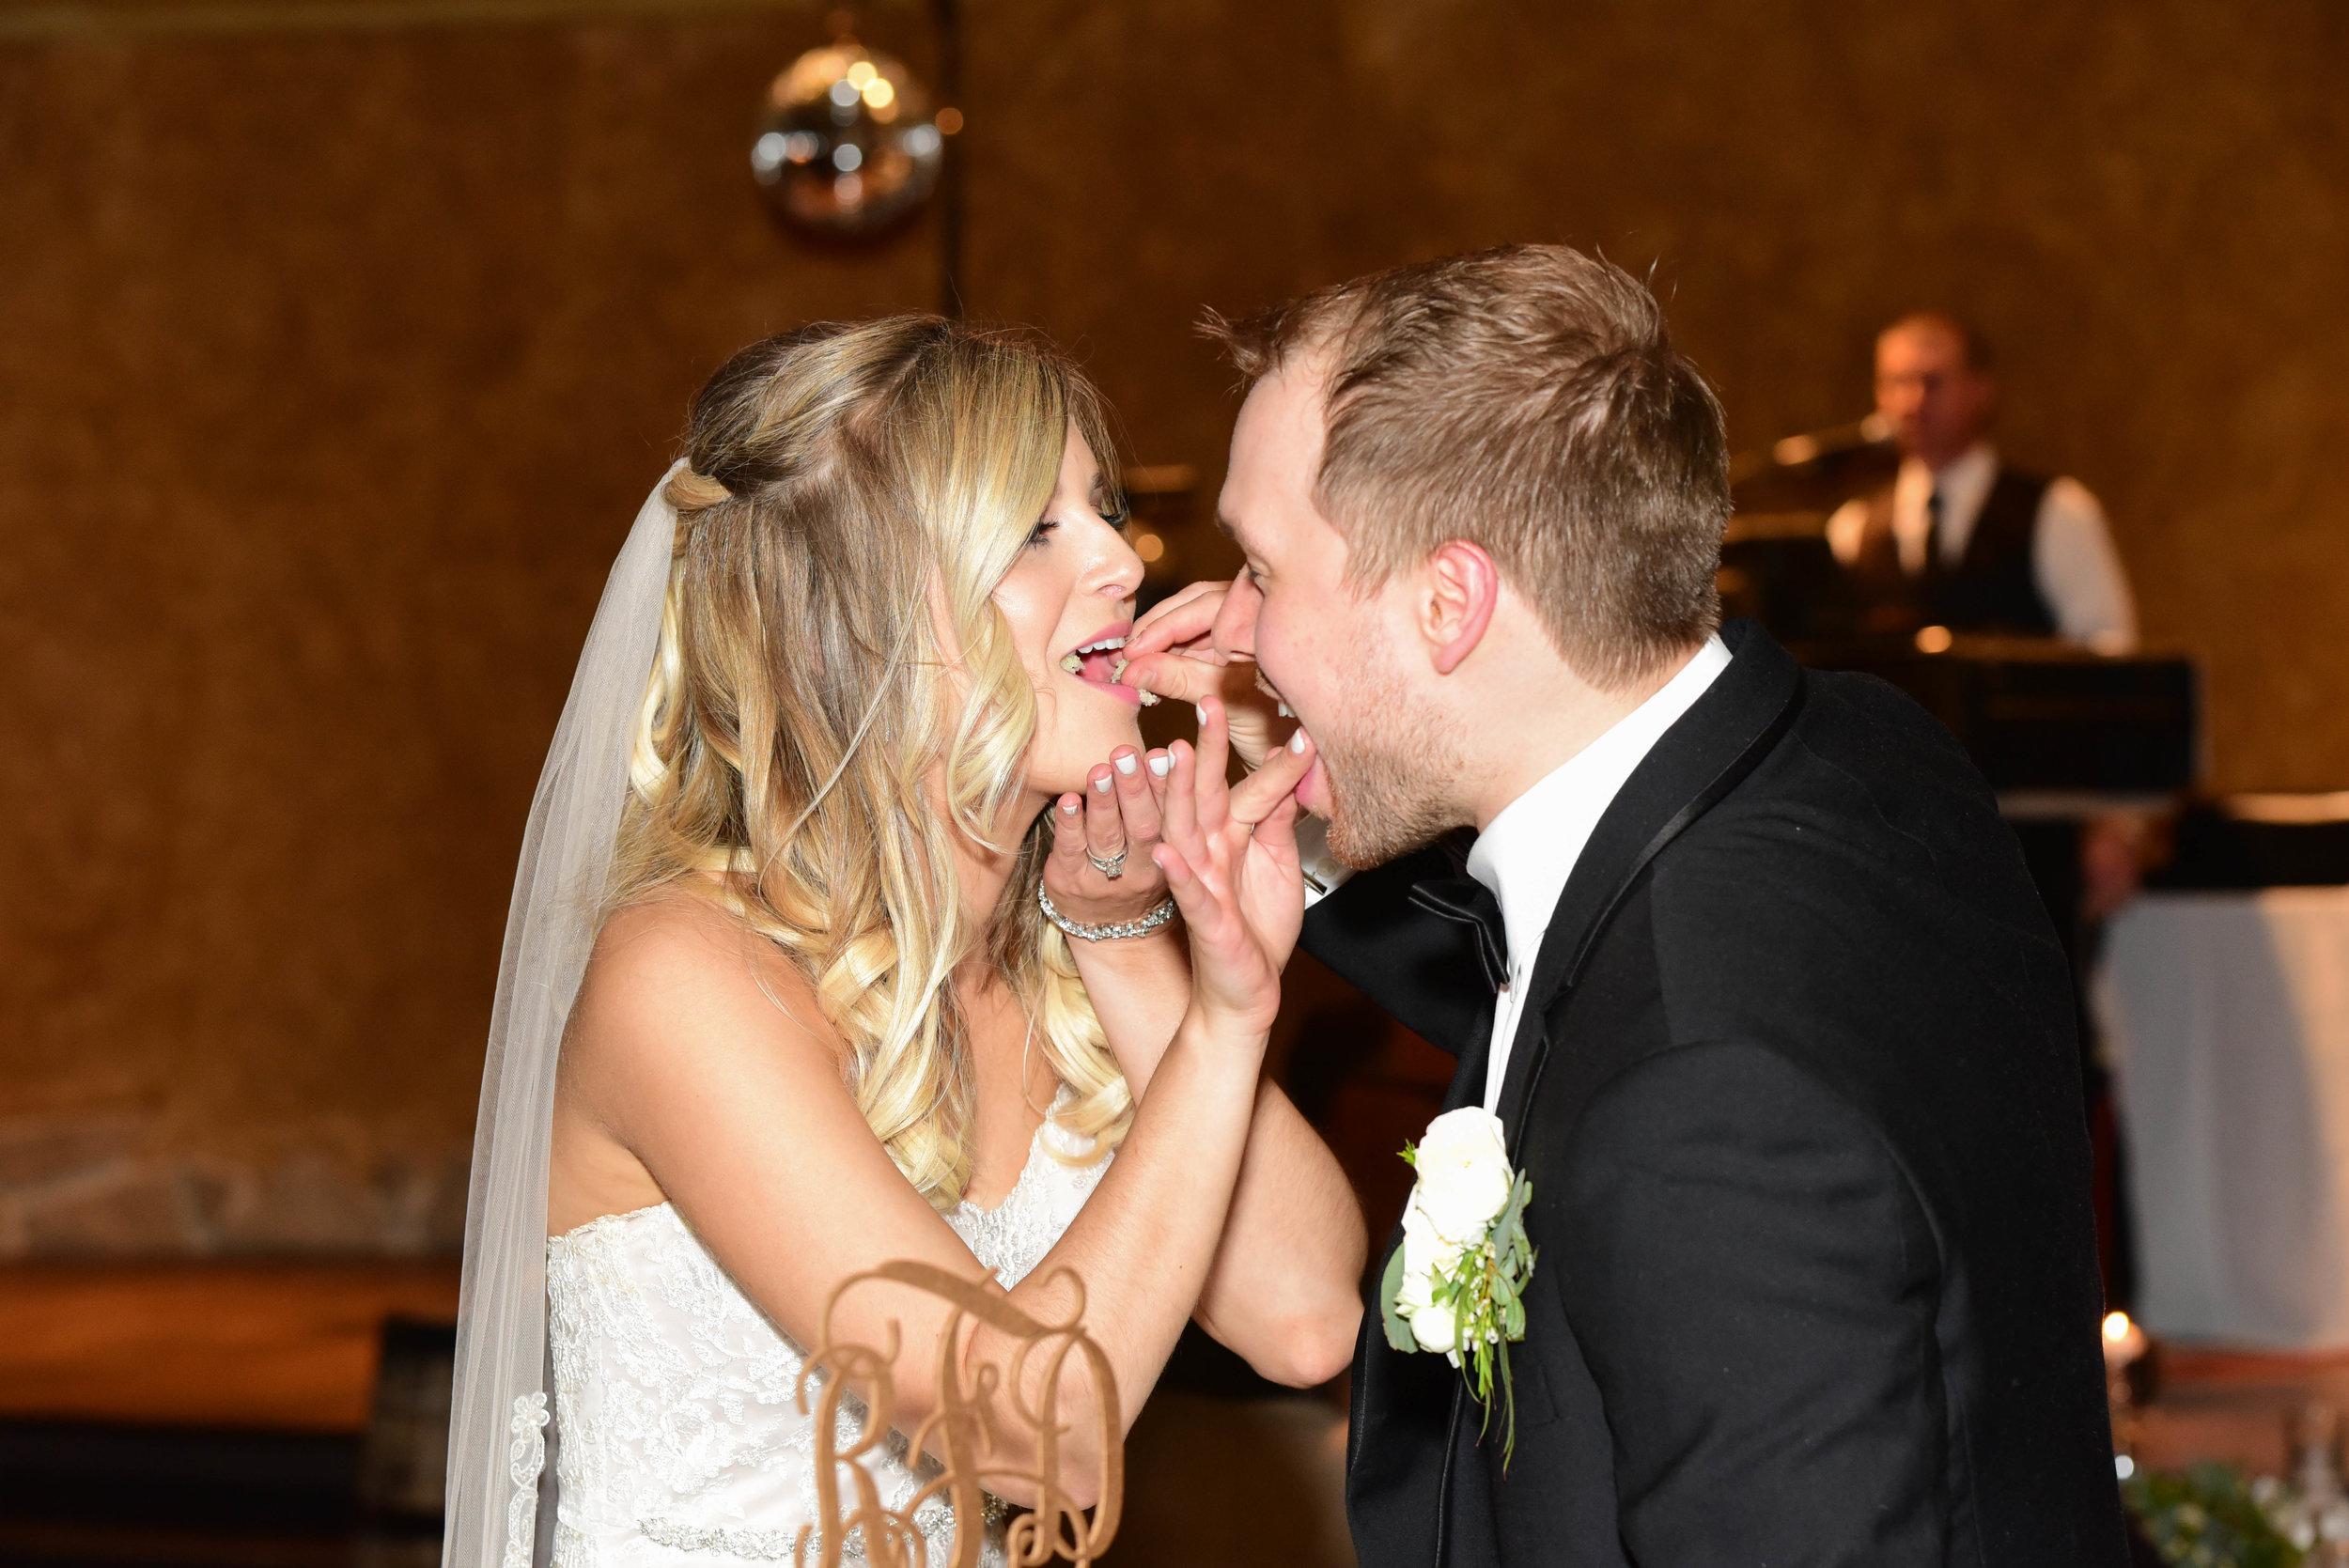 Dustin Rachel Cleveland Wedding 39.jpg